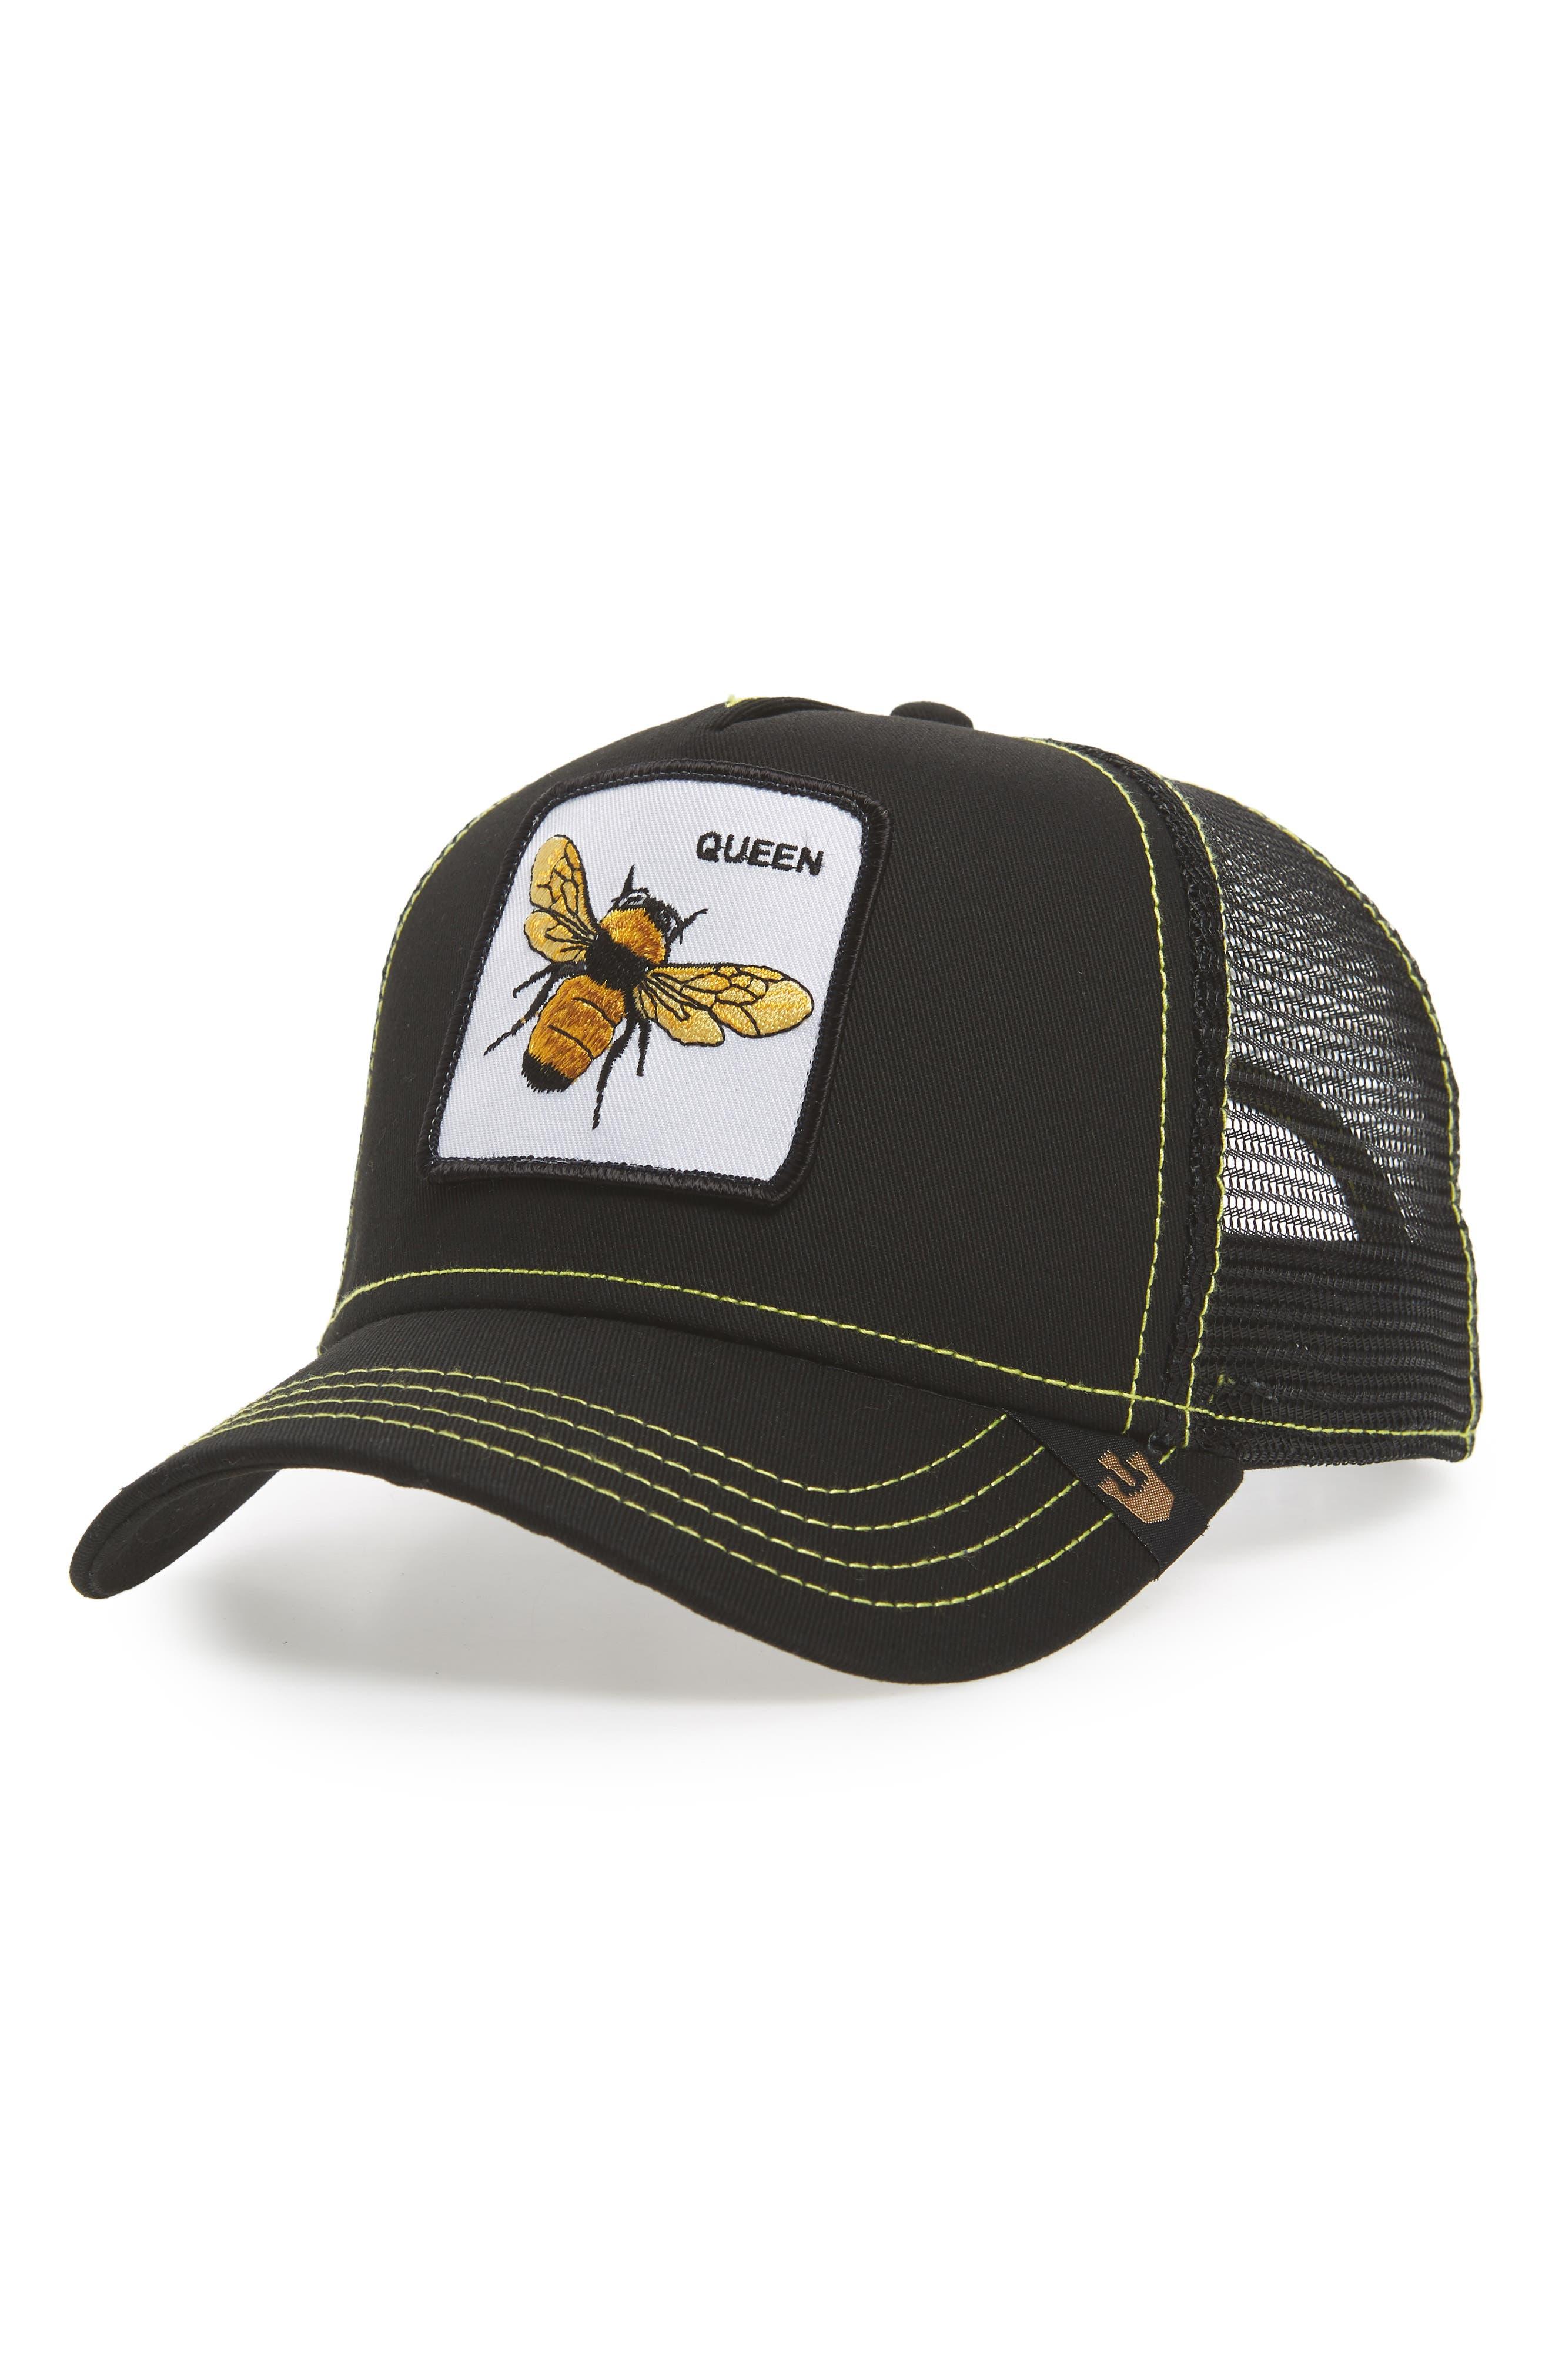 Queen Bee Trucker Cap,                             Main thumbnail 1, color,                             Black